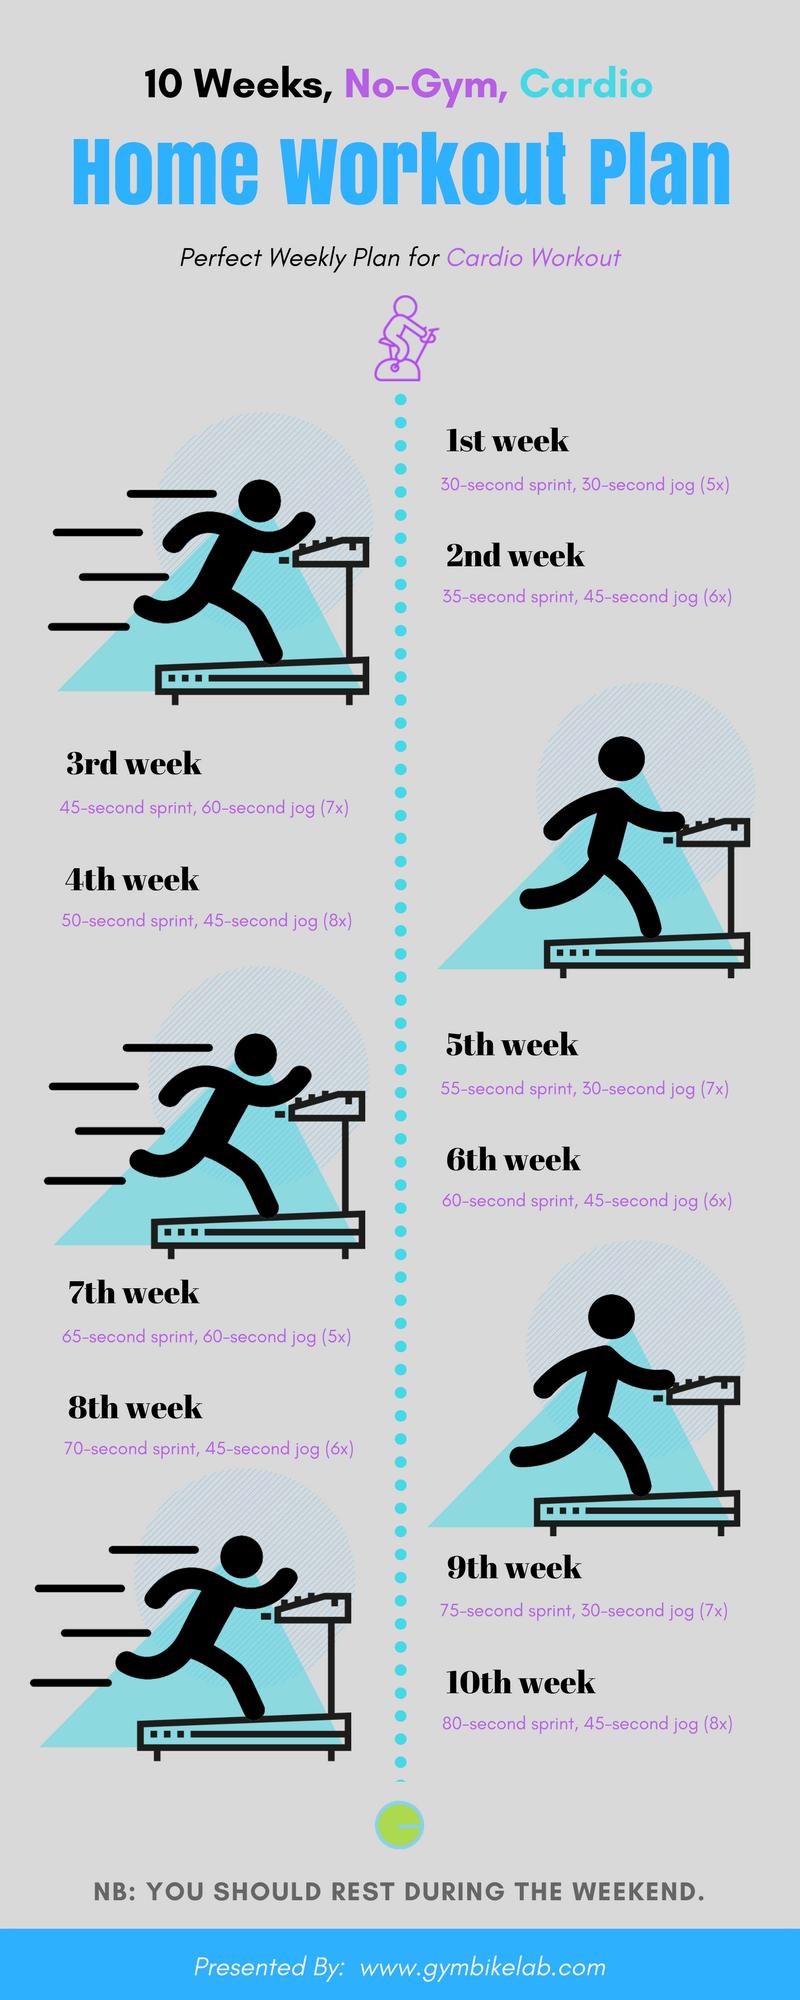 10 Week No Gym Home Workout Plan Cardio Exercise